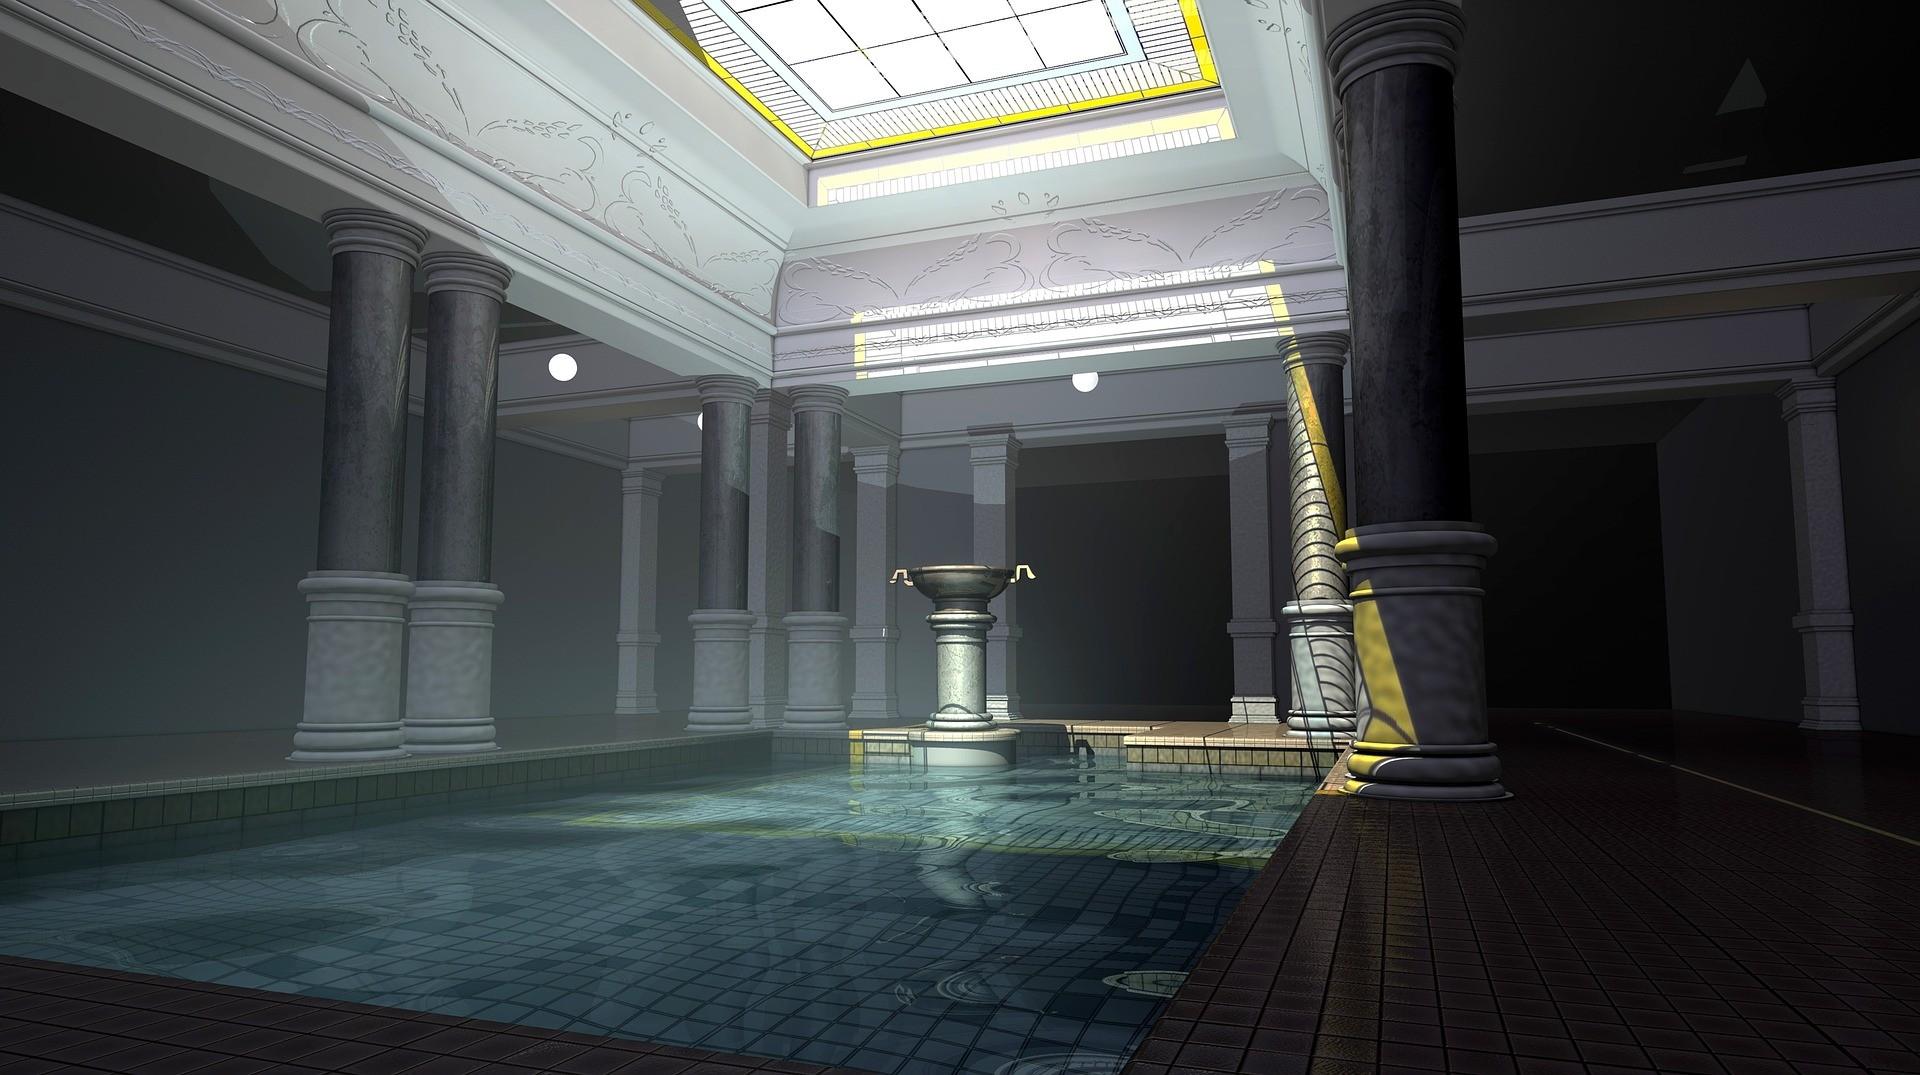 ▲SPA,游泳池,豪宅。(圖/取自免費圖庫Pixabay)